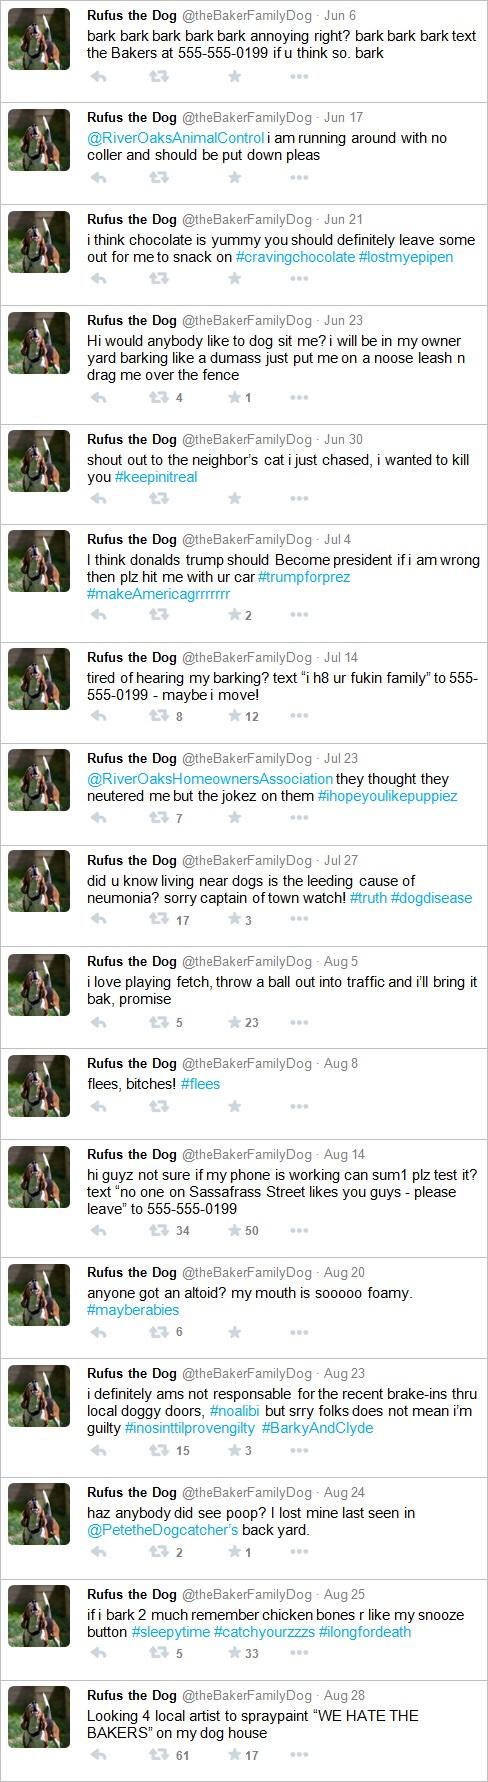 Dog Twitter